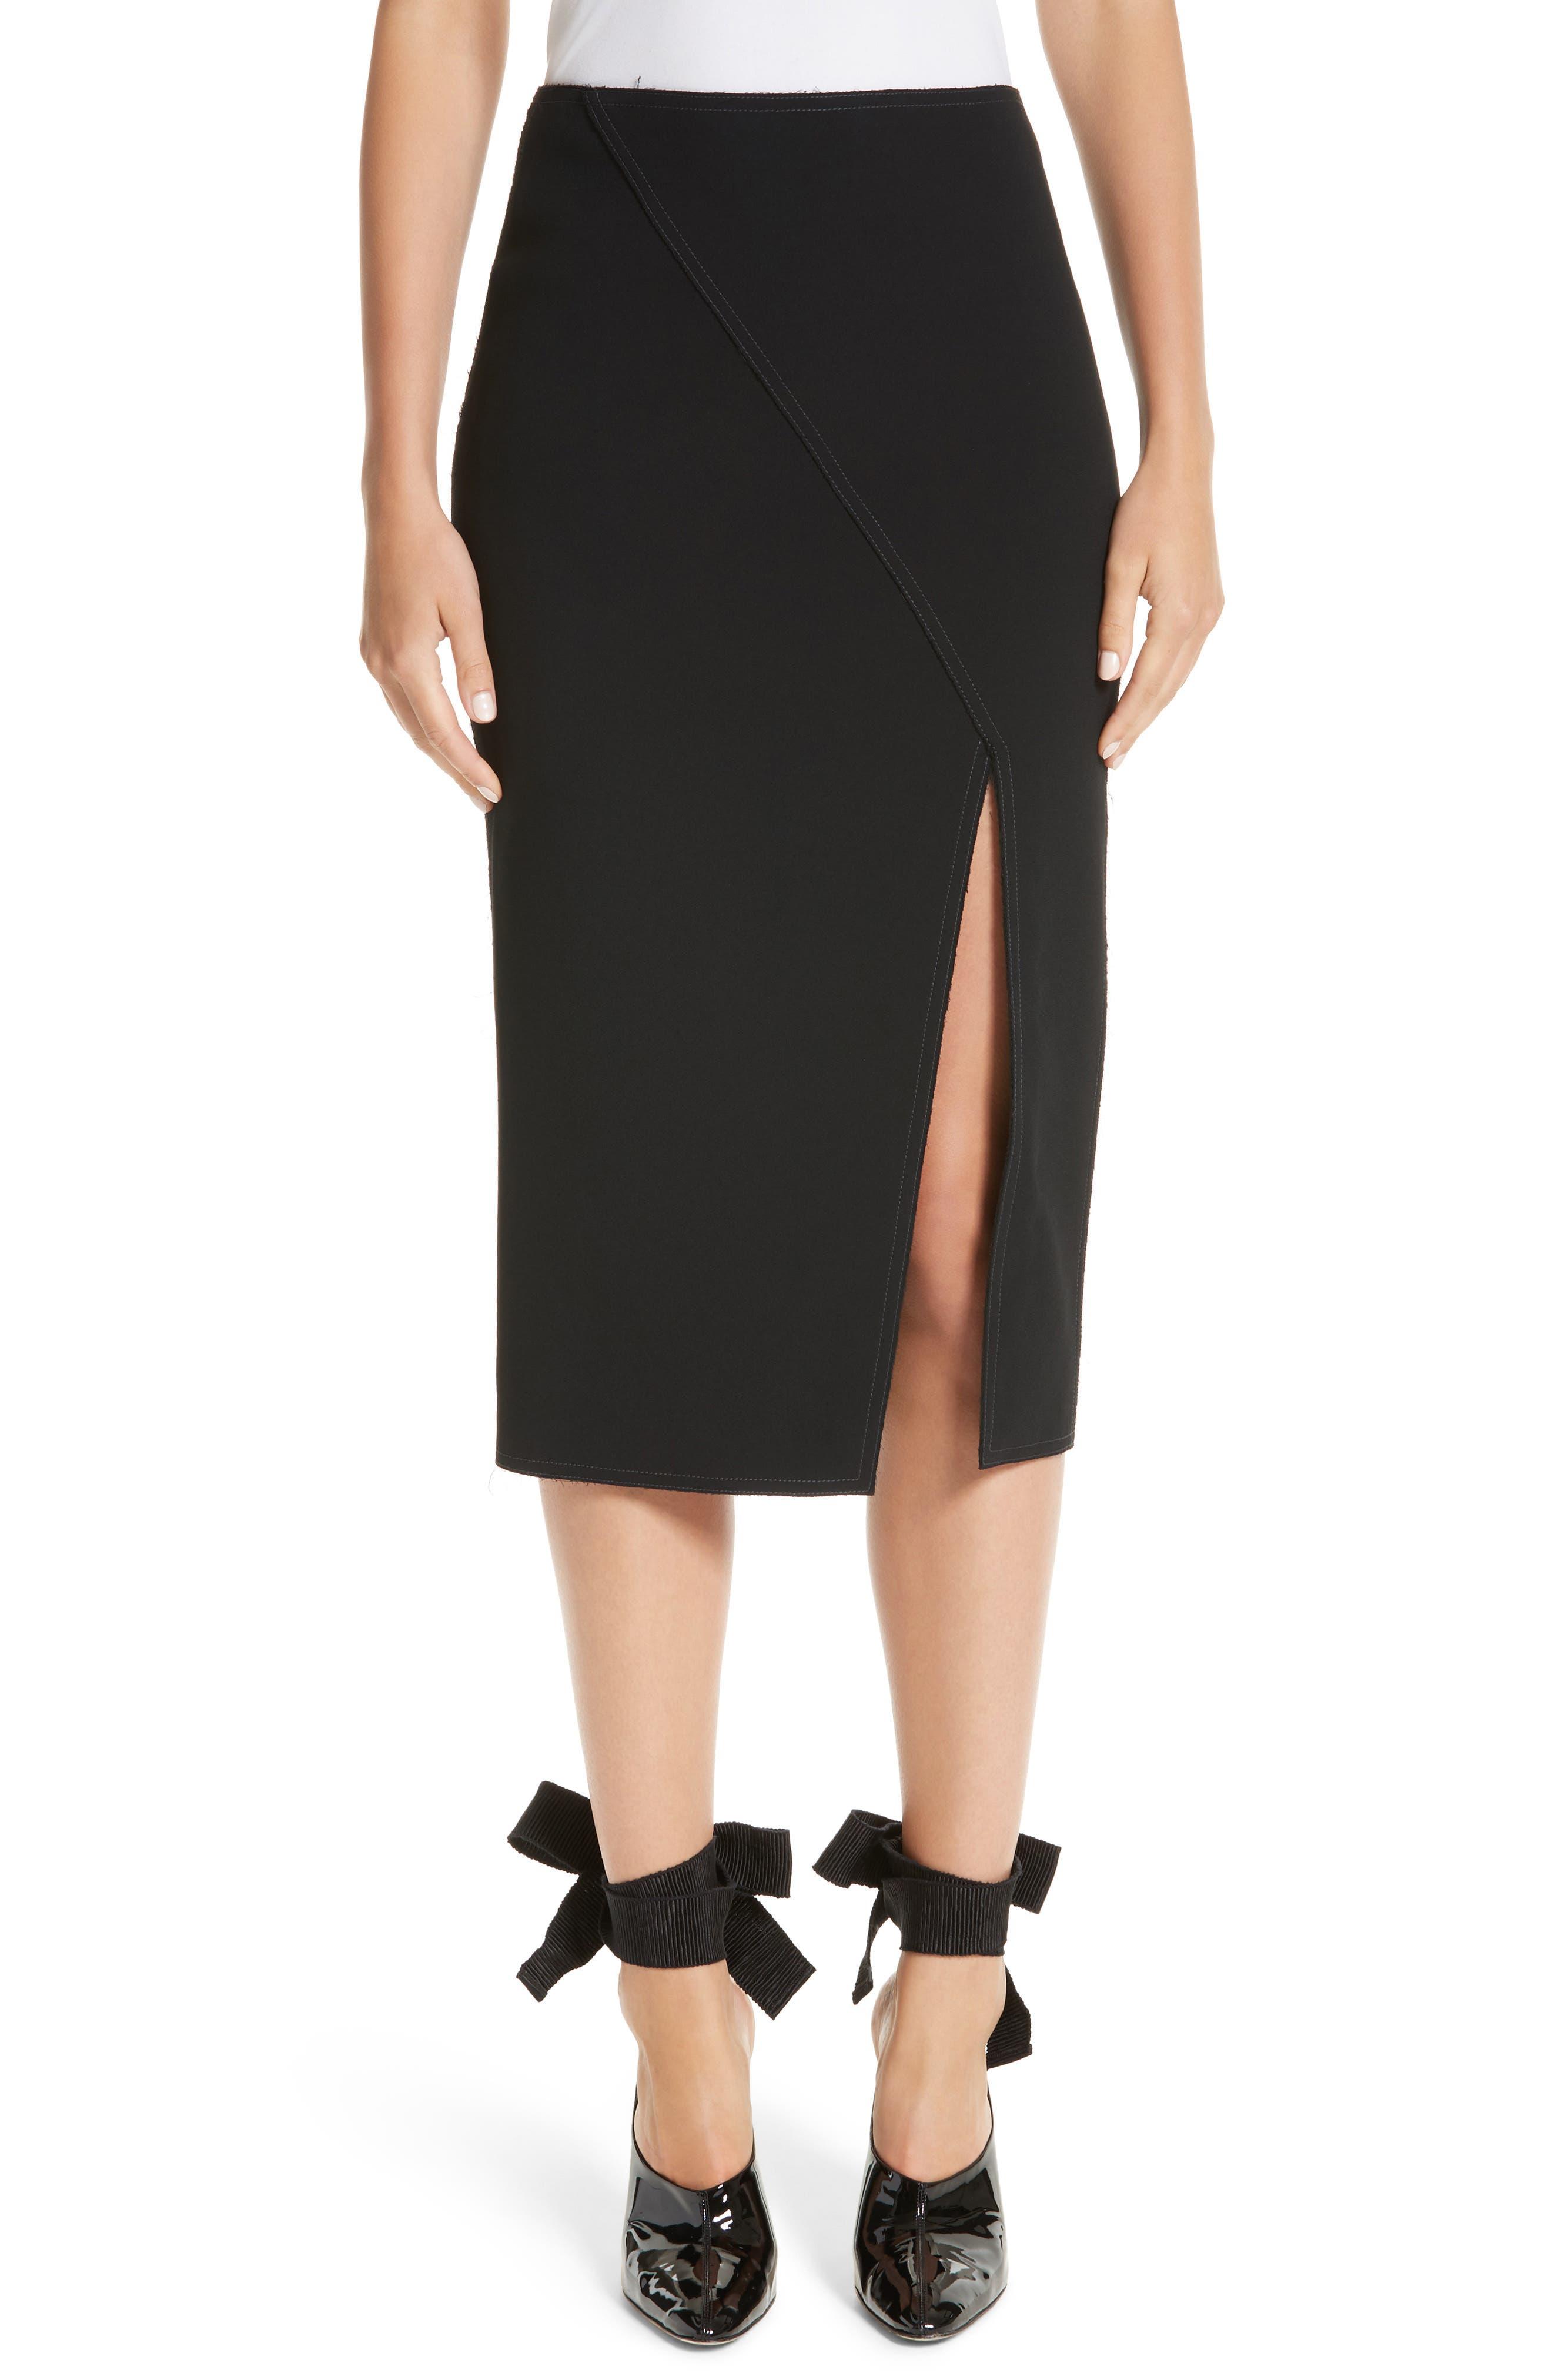 Alternate Image 1 Selected - Jason Wu Compact Crepe Pencil Skirt